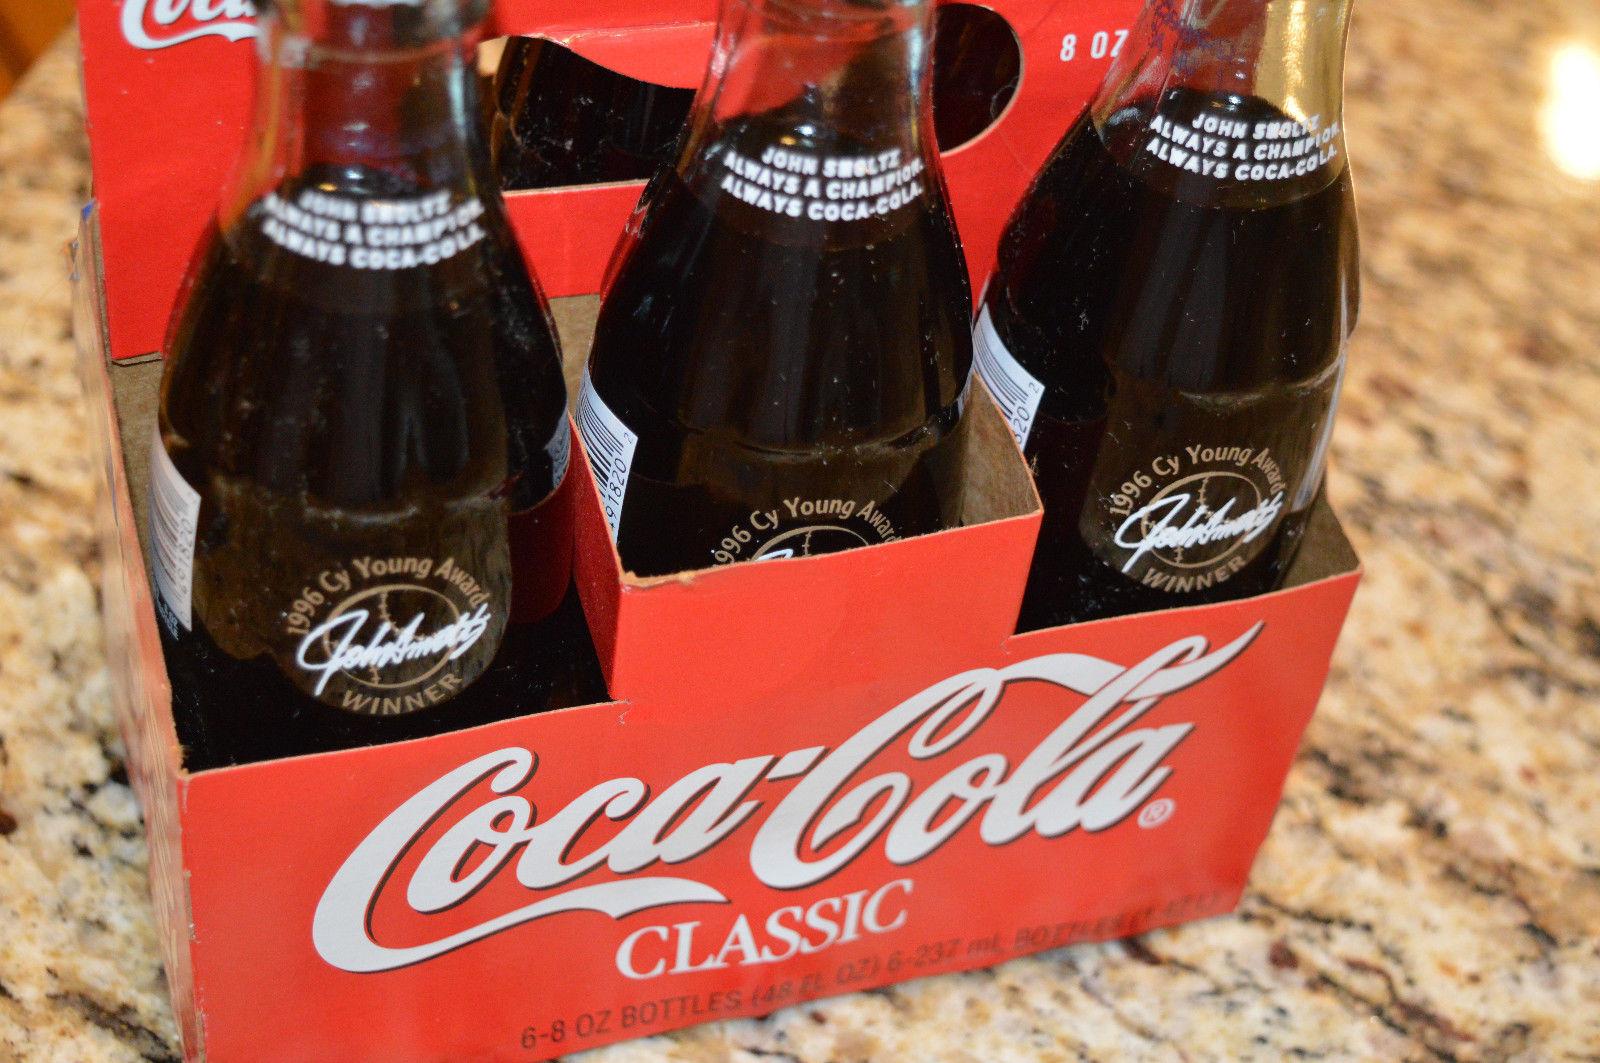 1996 Cy Young Award Winner John Smoltz Coca Cola Classic Bottle 8 Oz Coke